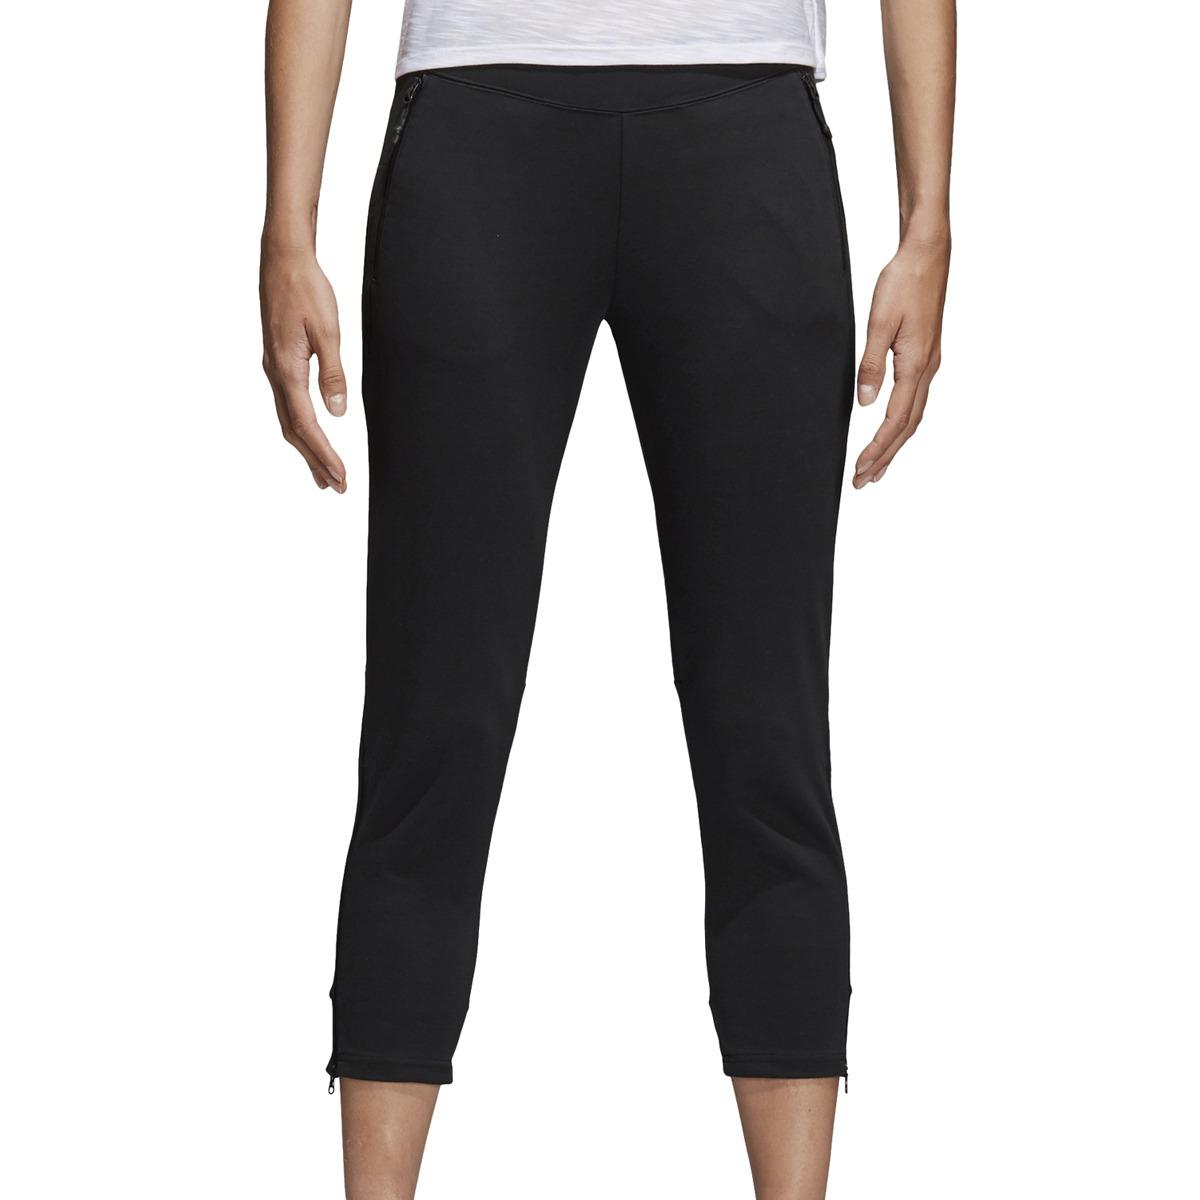 pantalon adidas training w id glory skinny mujer ng. Cargando zoom. af1ea9f7ca7